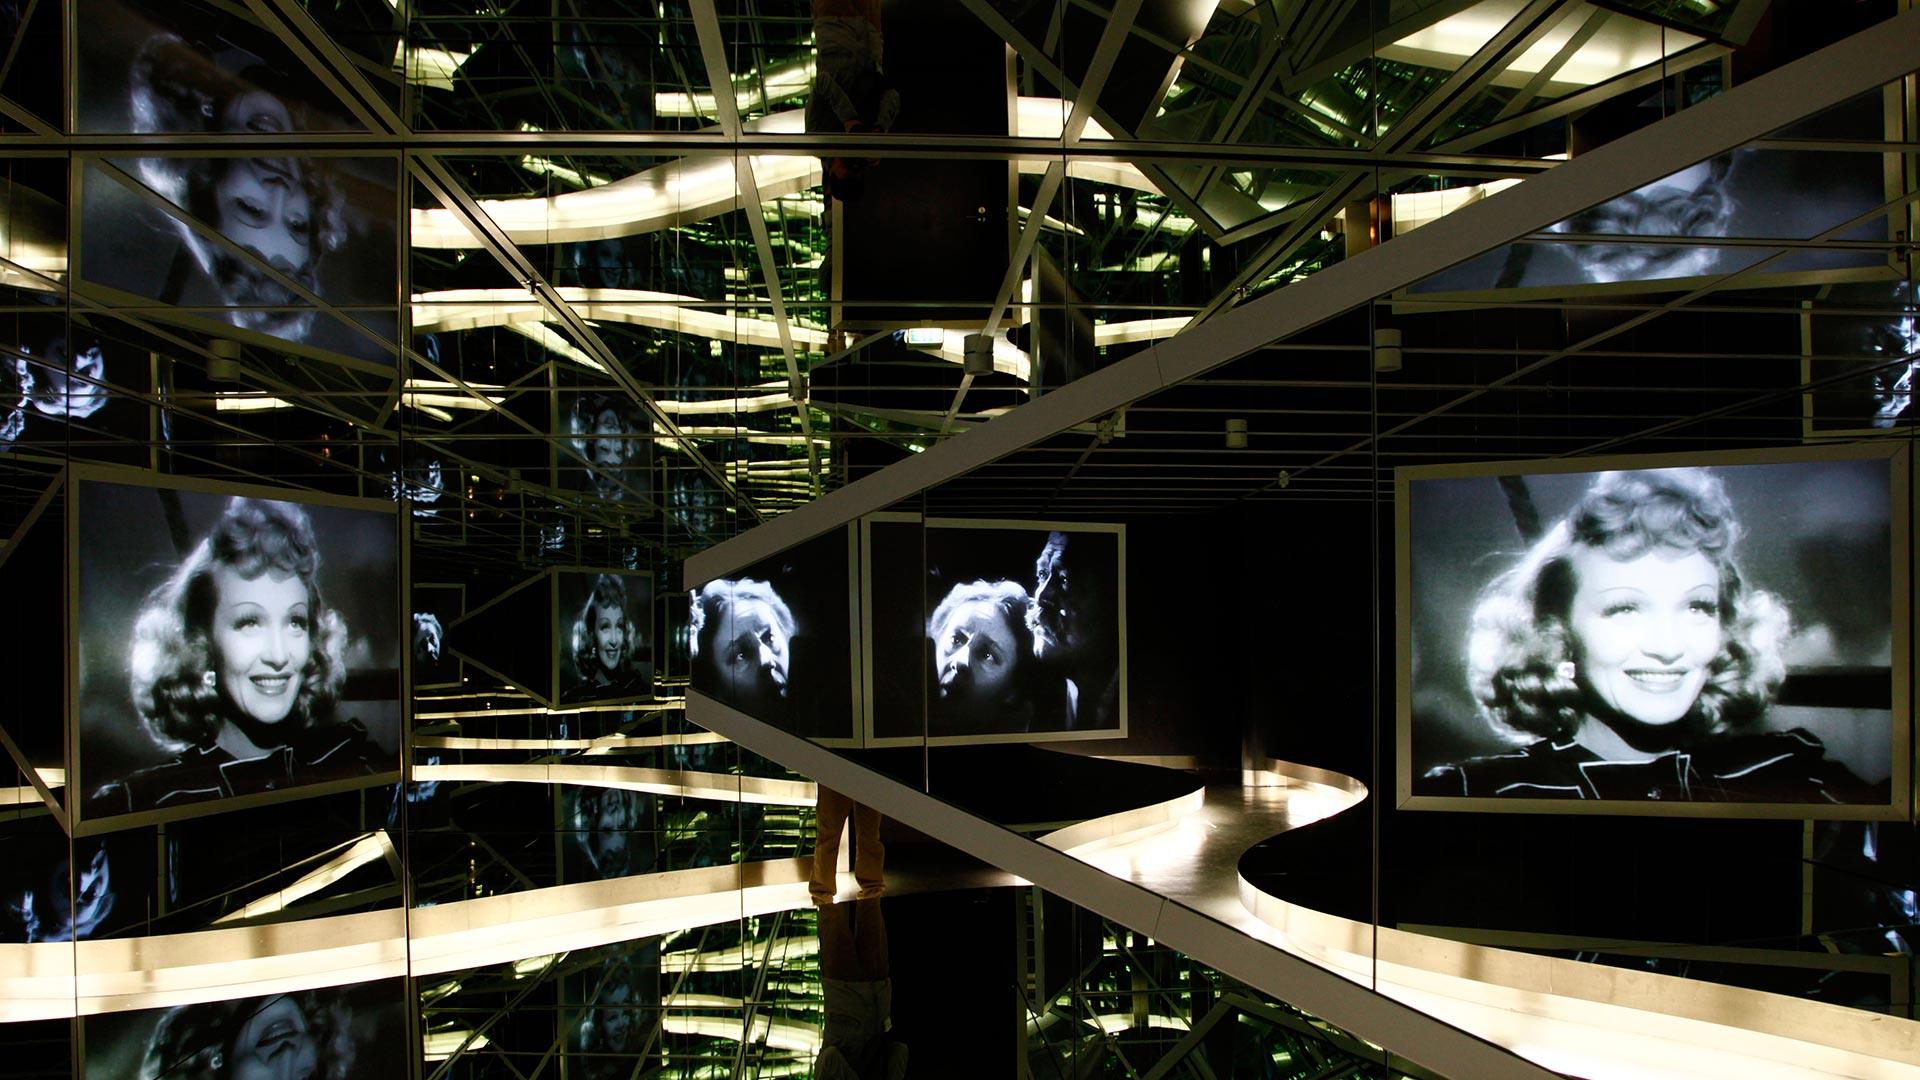 Berlinale 2020 Opening